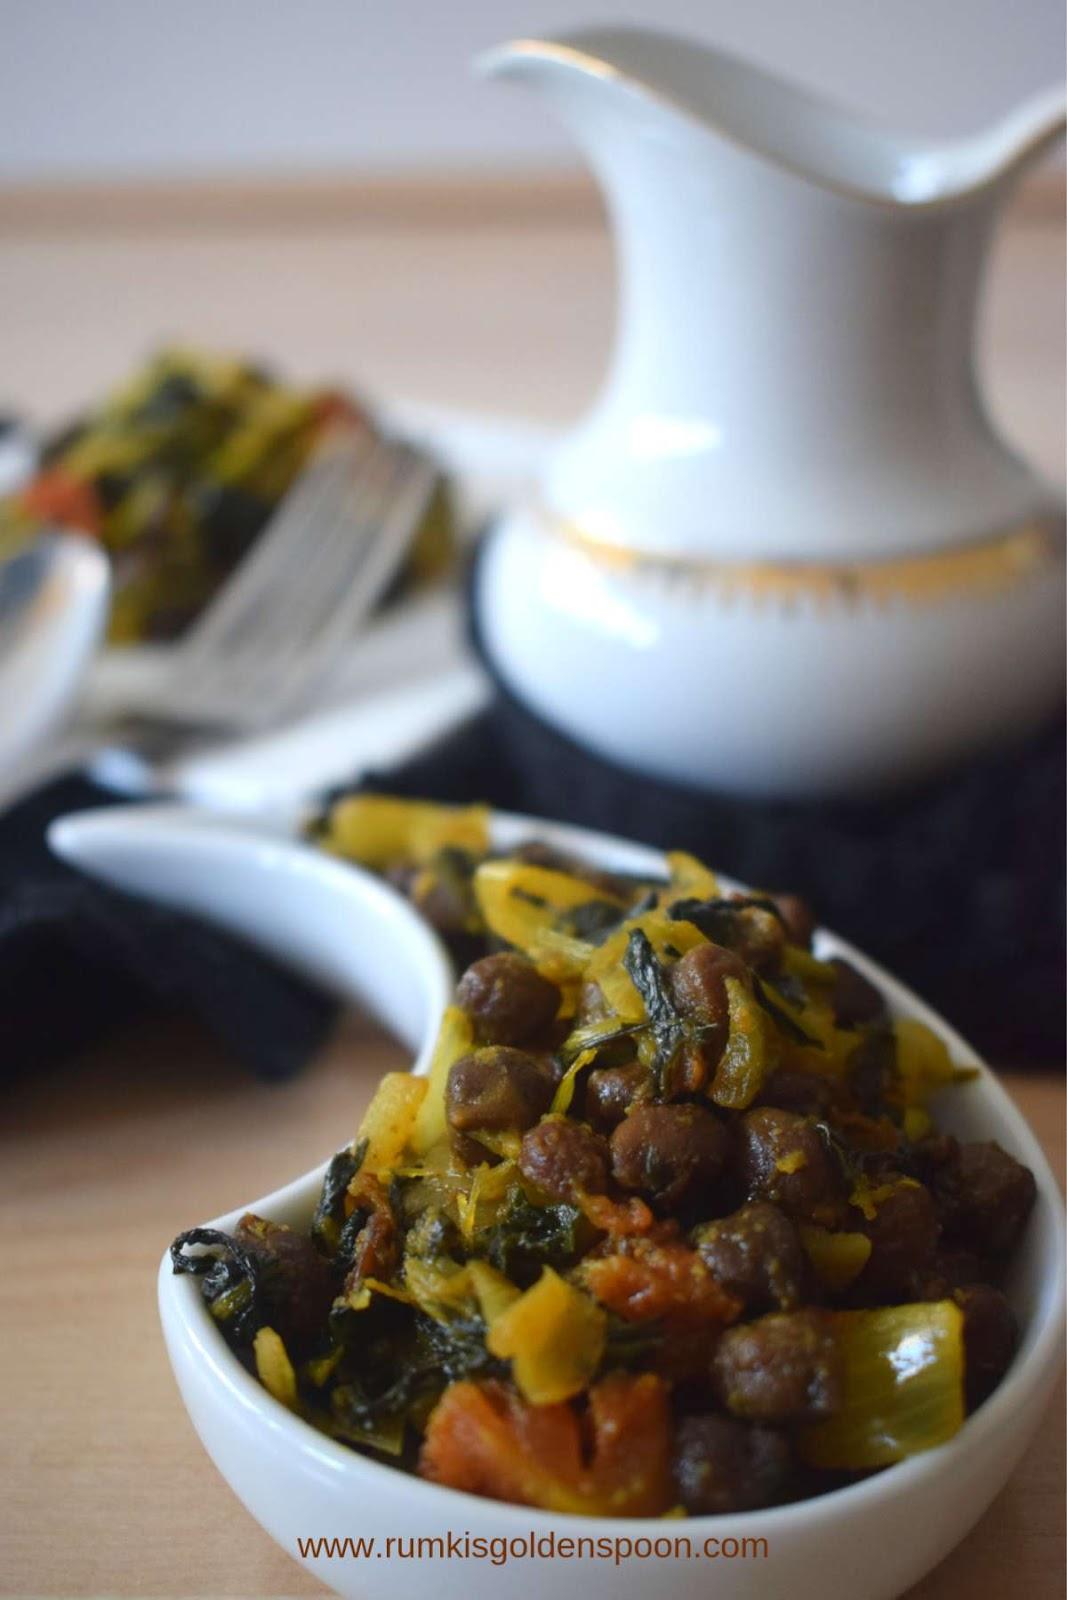 Indian Recipe, Vegetarian, Vegan, Kala Chana Palak | Black Chickpeas-Spinach Dry Curry, Rumki's Golden Spoon, Palak kala chana sukhi sabzi/ sabji/ tarkaari, recipe with spinach, spinach dry curry recipe, recipe with chickpeas/ chana, Indian curry recipe with chole/ chana/ chickpeas, palak shaag ki sabji/ sabzi/ tarkaari, palong shaaker chola diye tarkaari